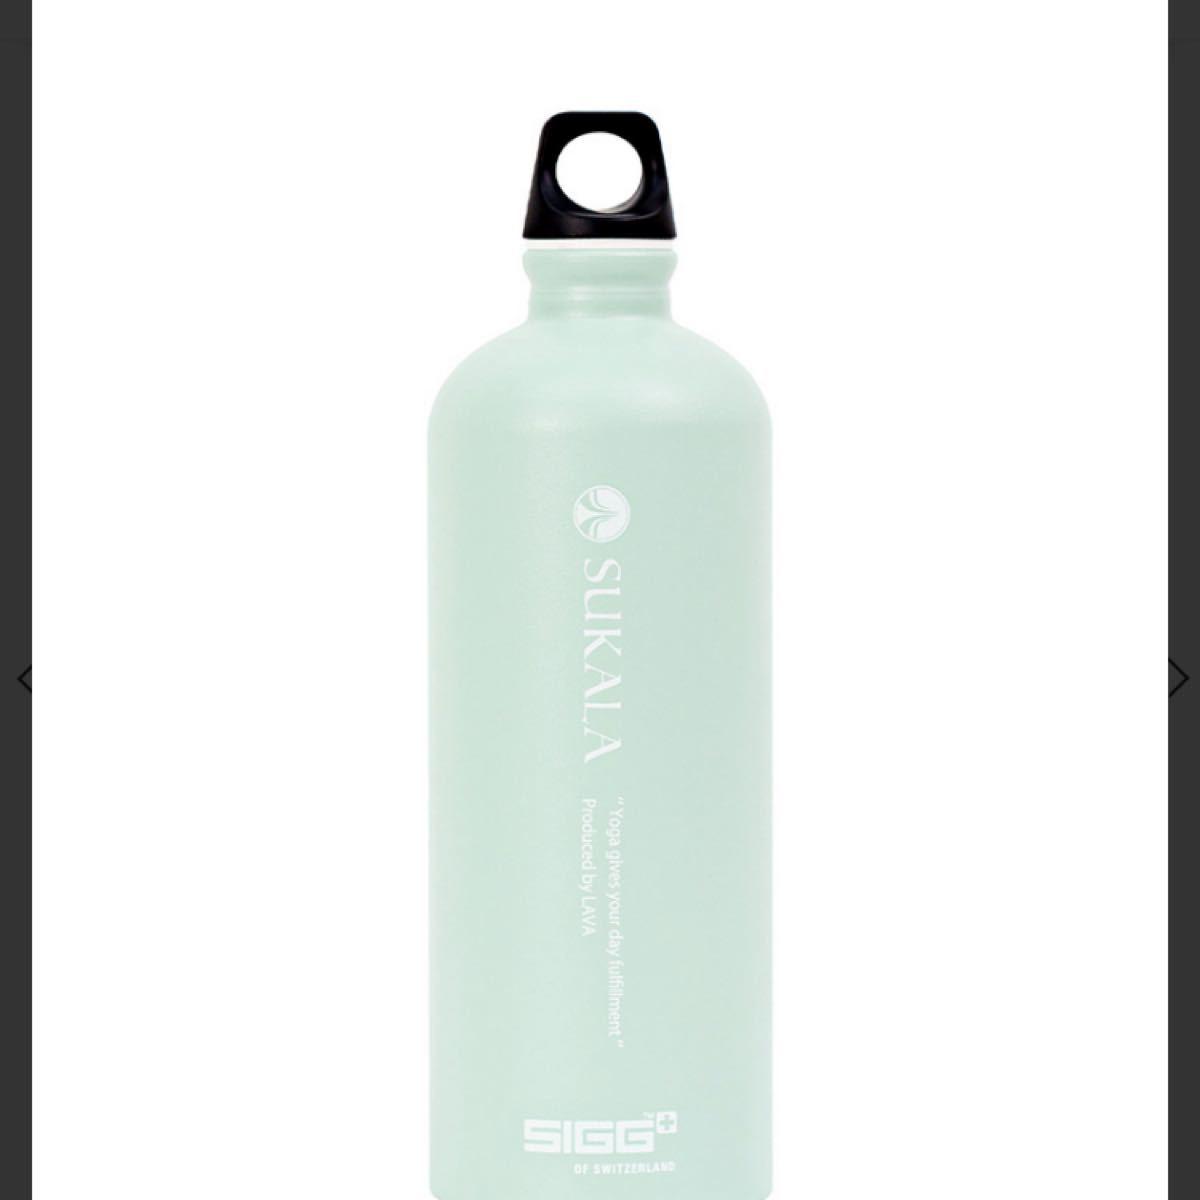 LAVA水素水ボトル2色セット新品未使用